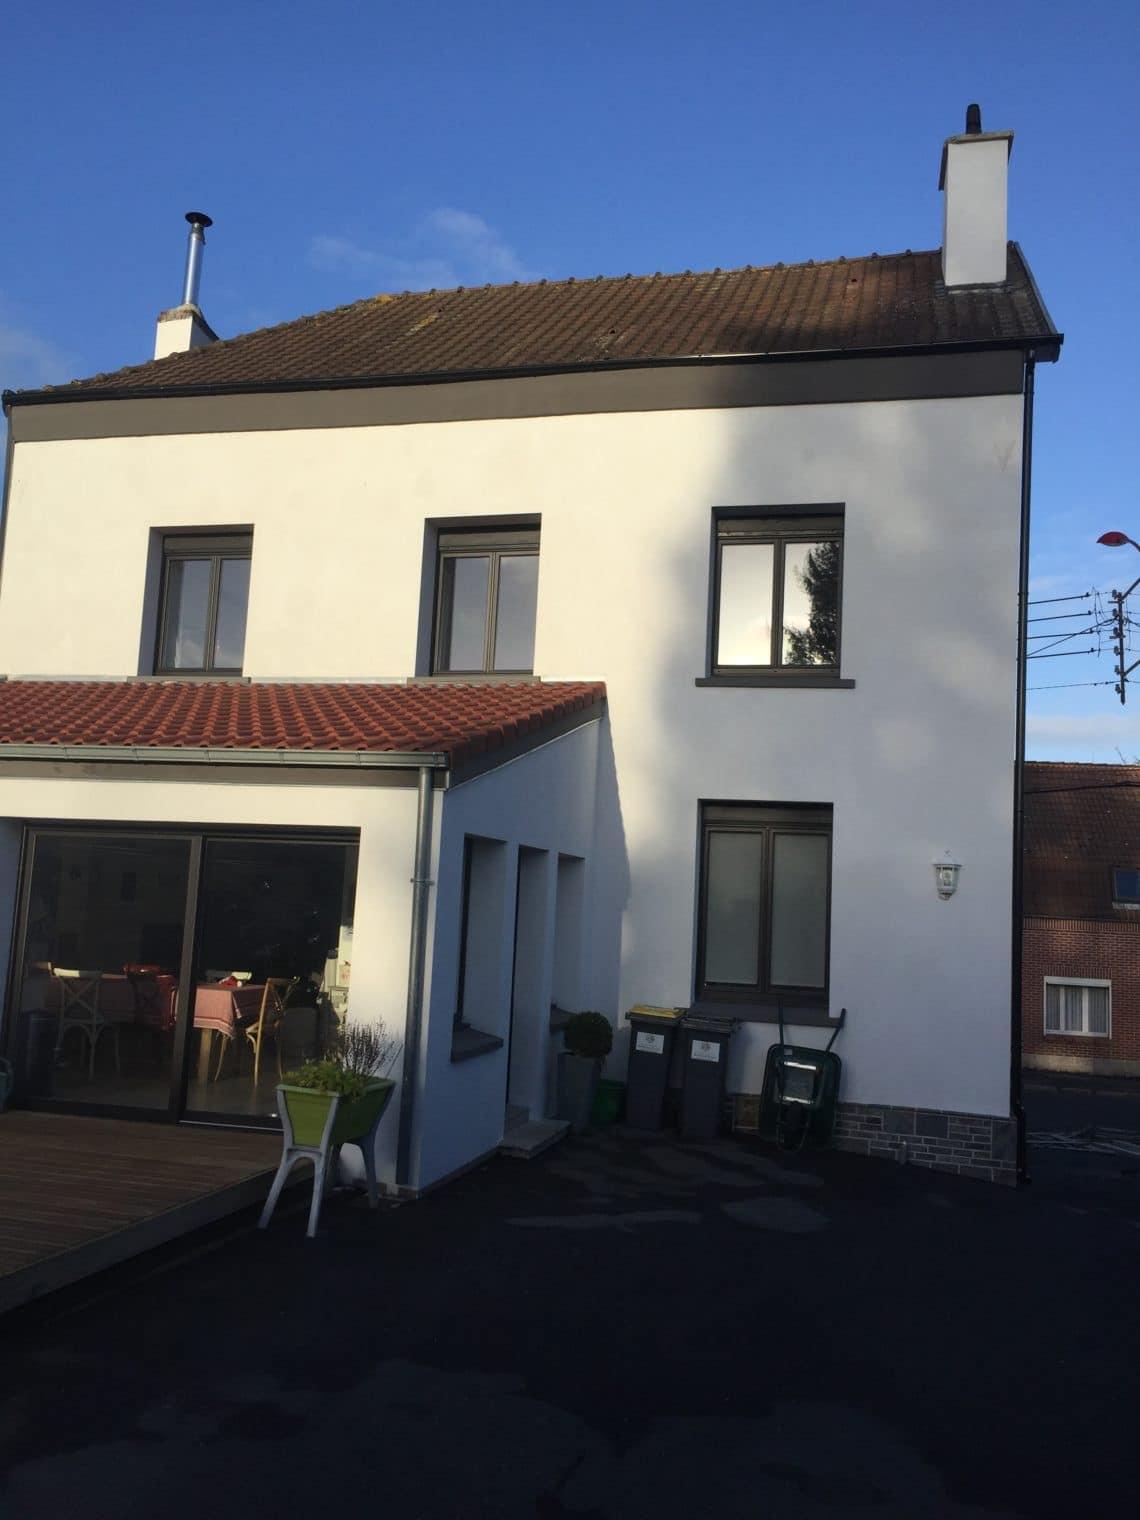 Urbel_renovation_facade_calonne_ricouart-2-e1545142763333-1140x1520.jpg